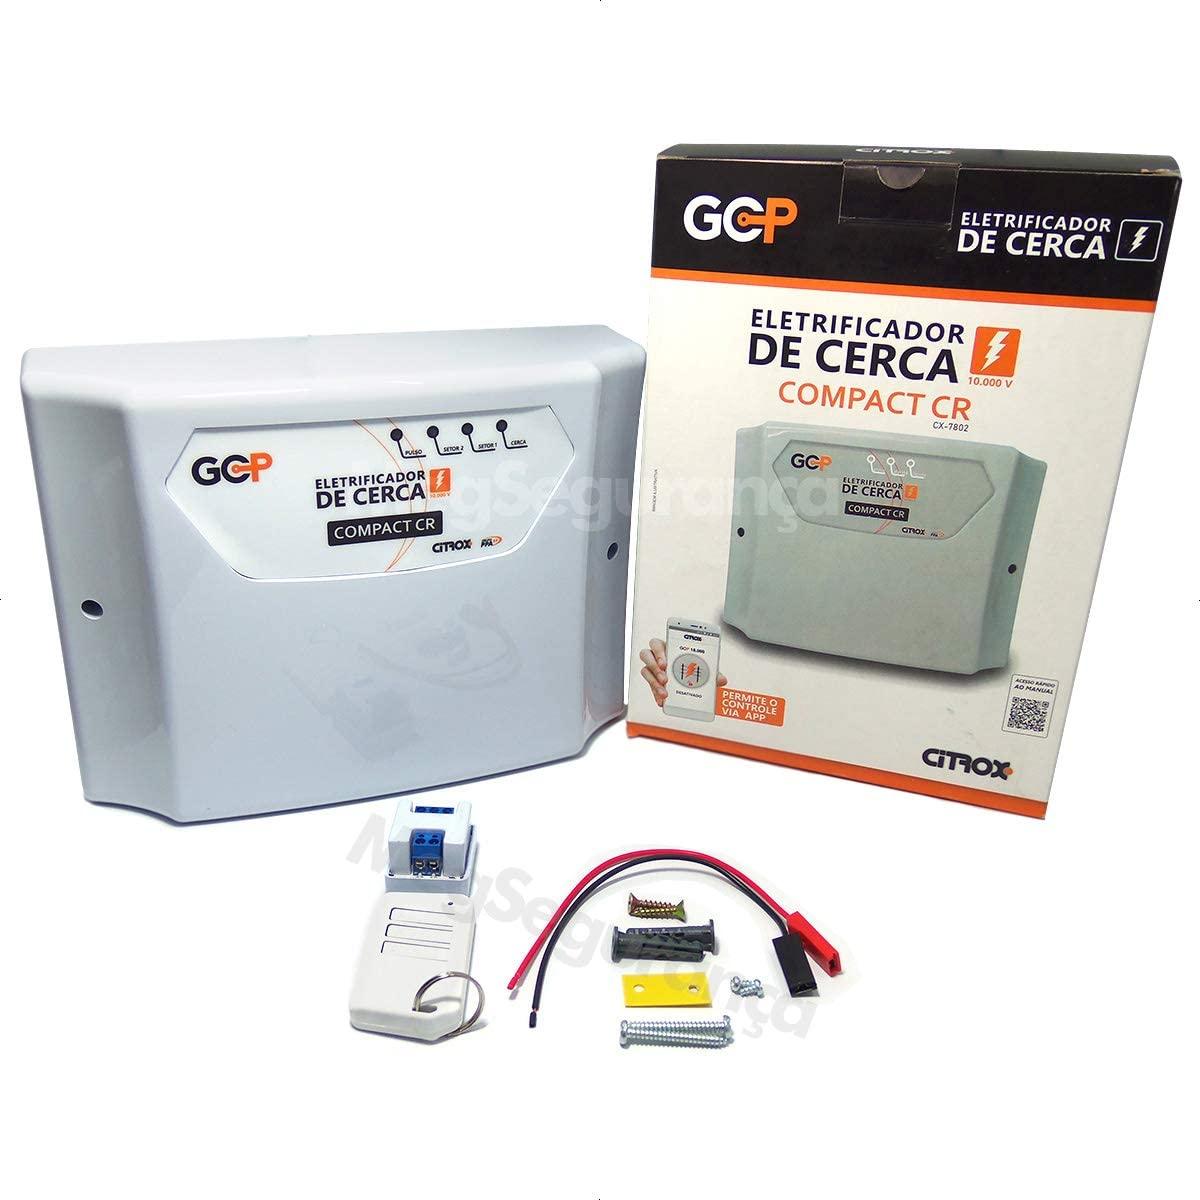 Central de cerca elétrica GCP 10.000 Compact CR - Citrox